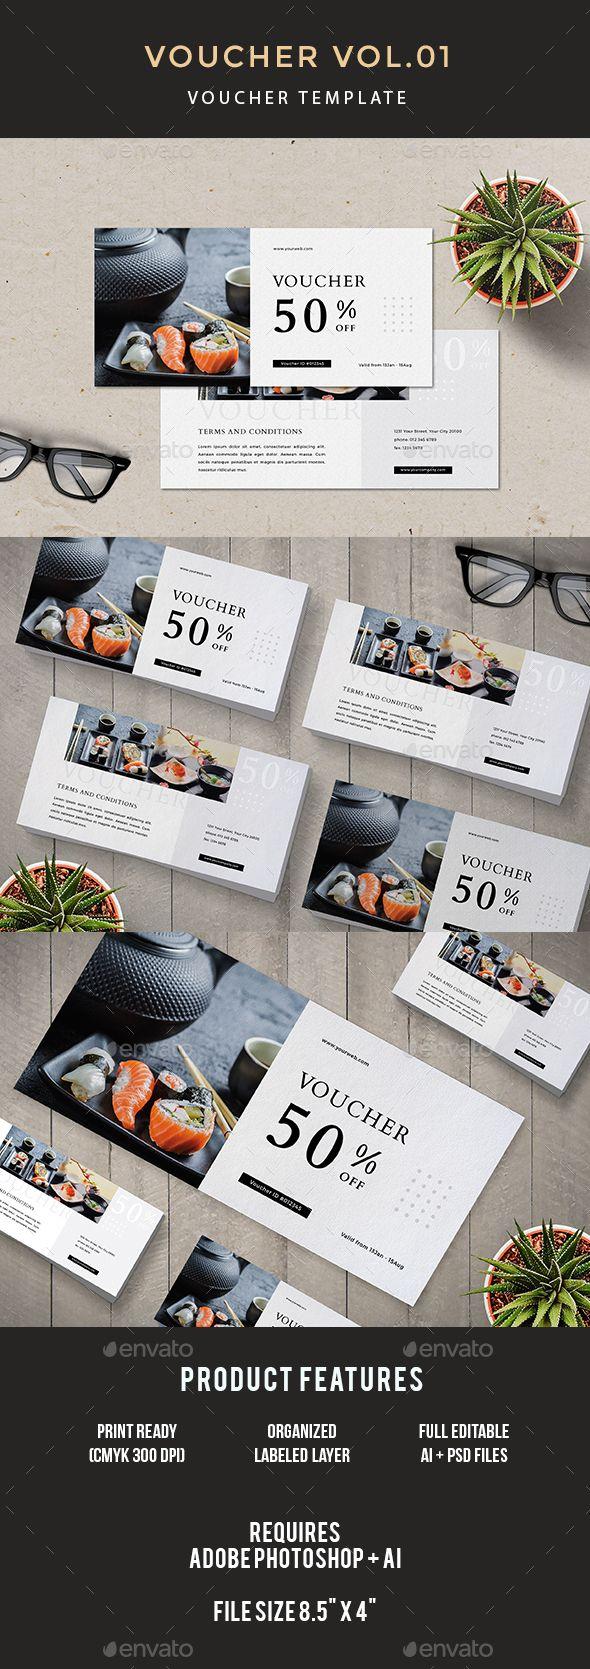 Voucher cards coupons and gift voucher design voucher xflitez Choice Image